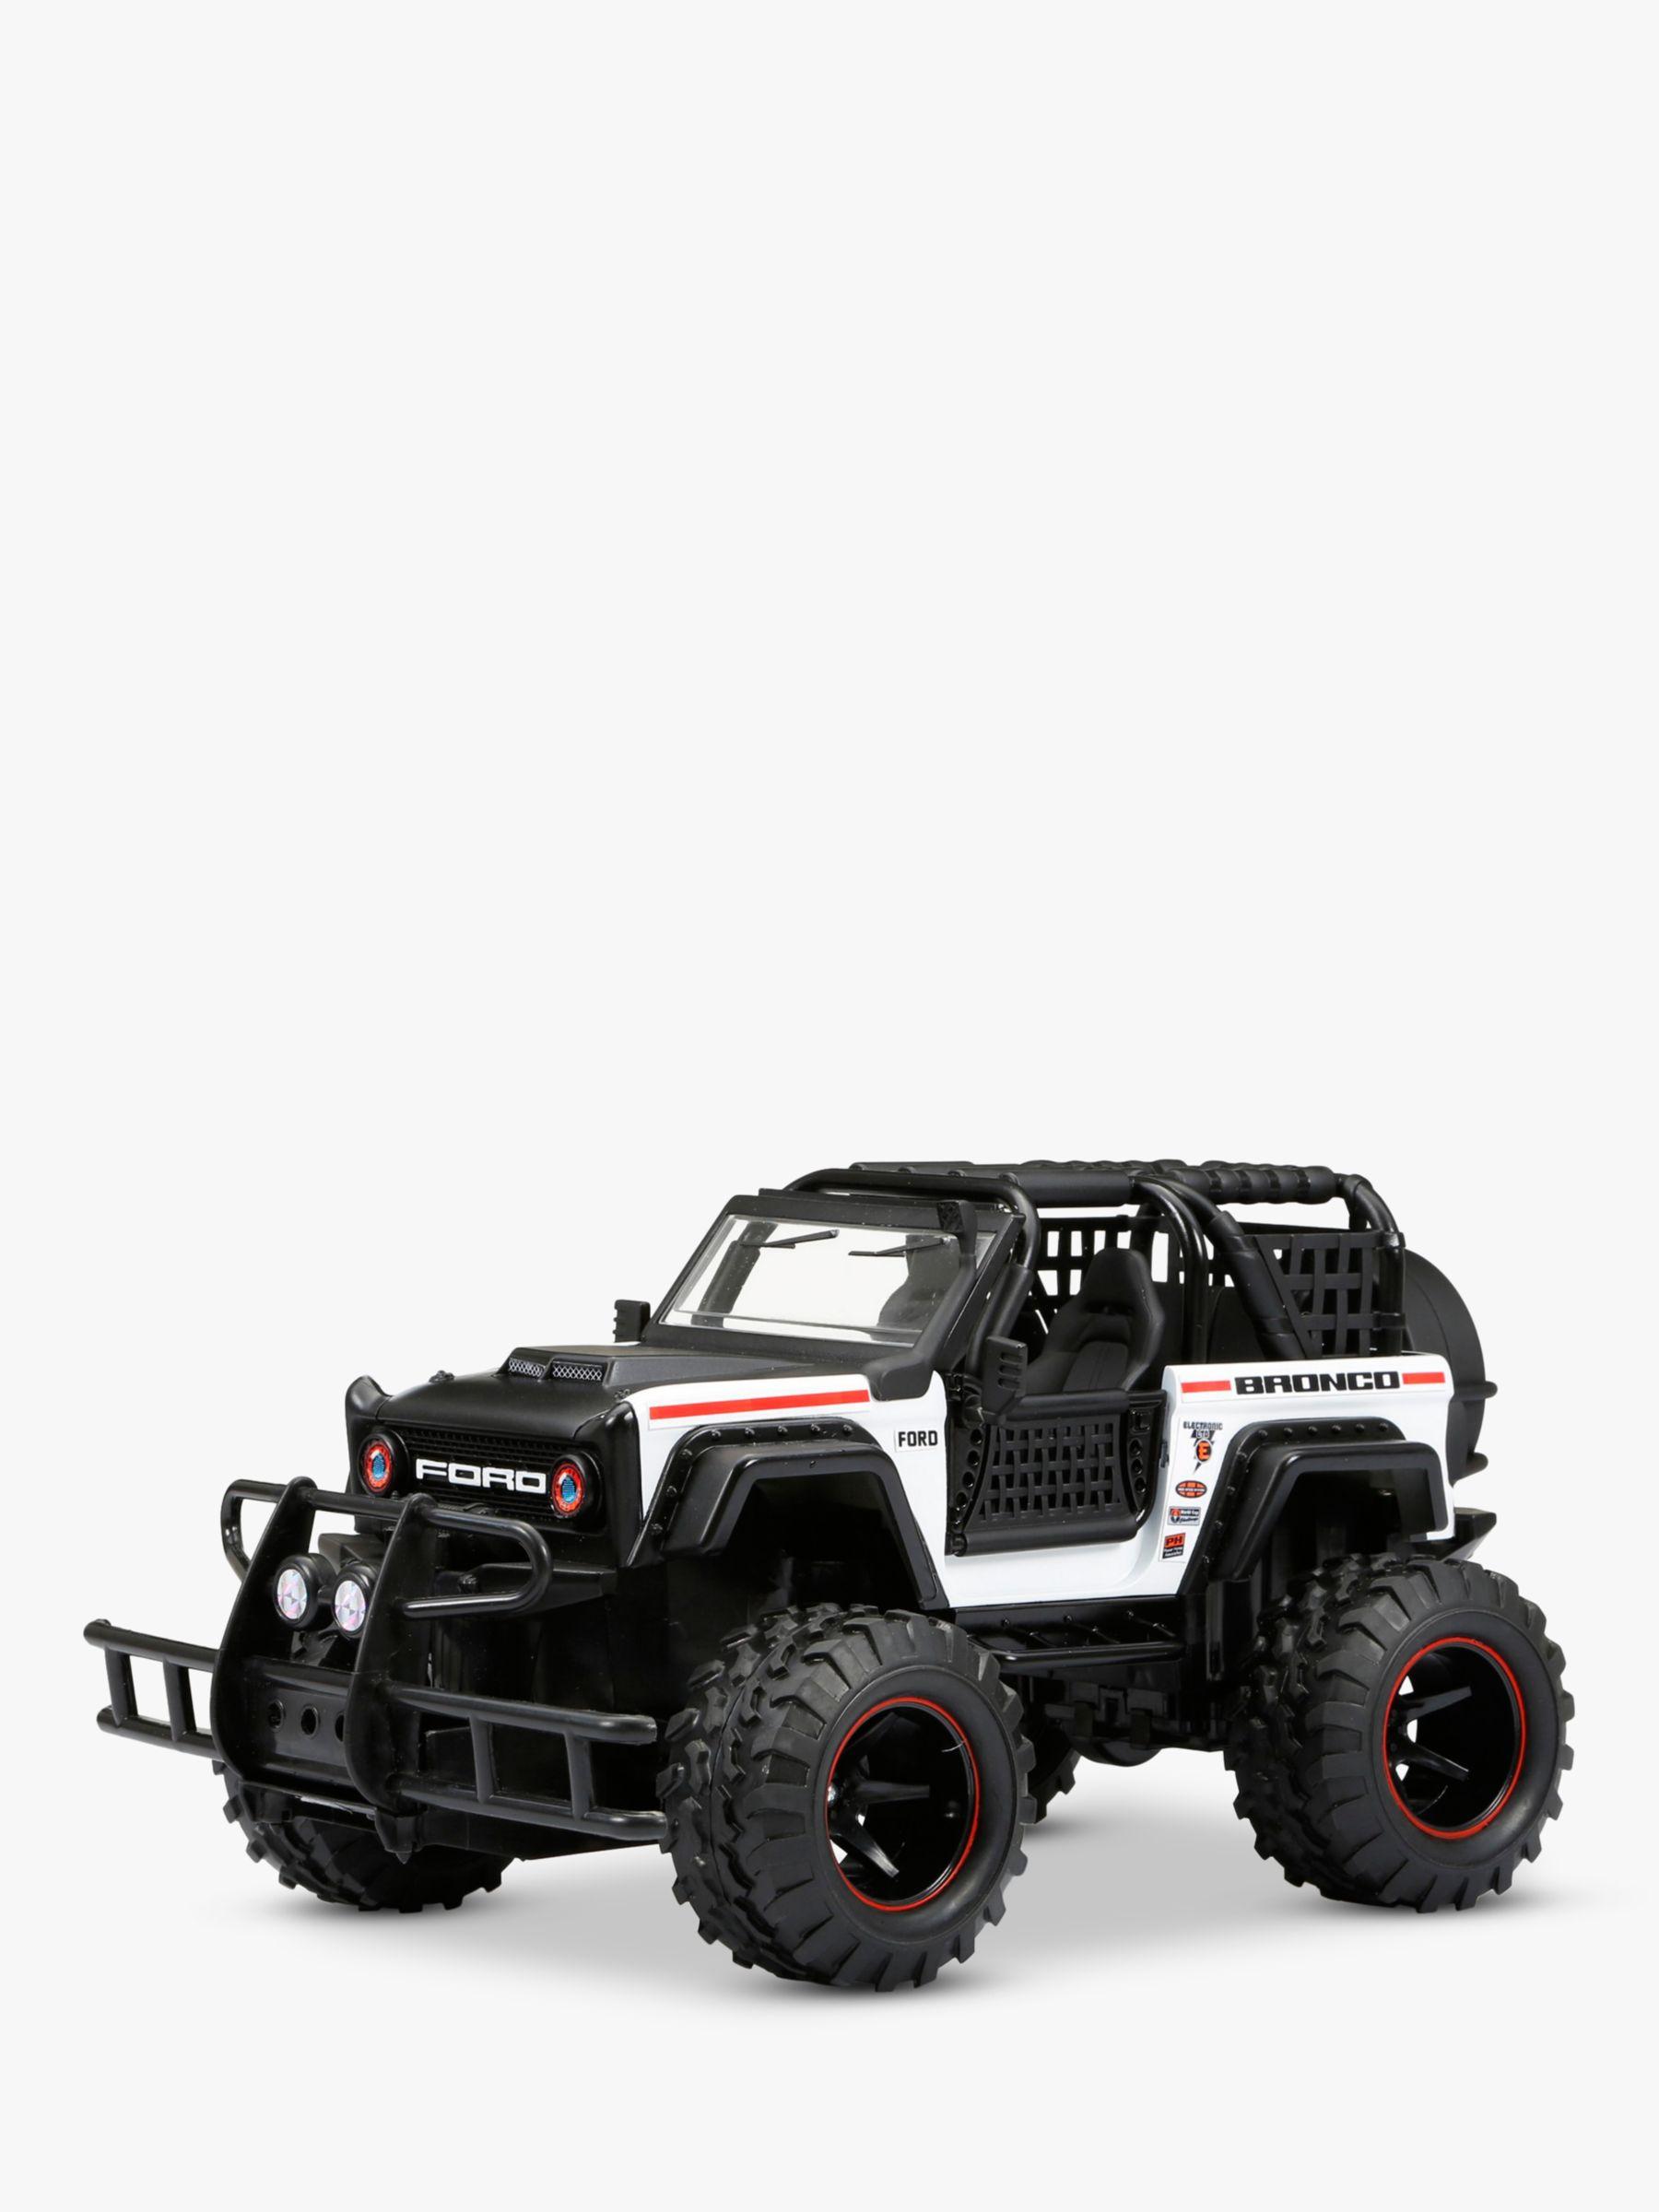 New Bright New Bright Radio-Controlled 4x4 Rock Crawler Ford Bronco Truck